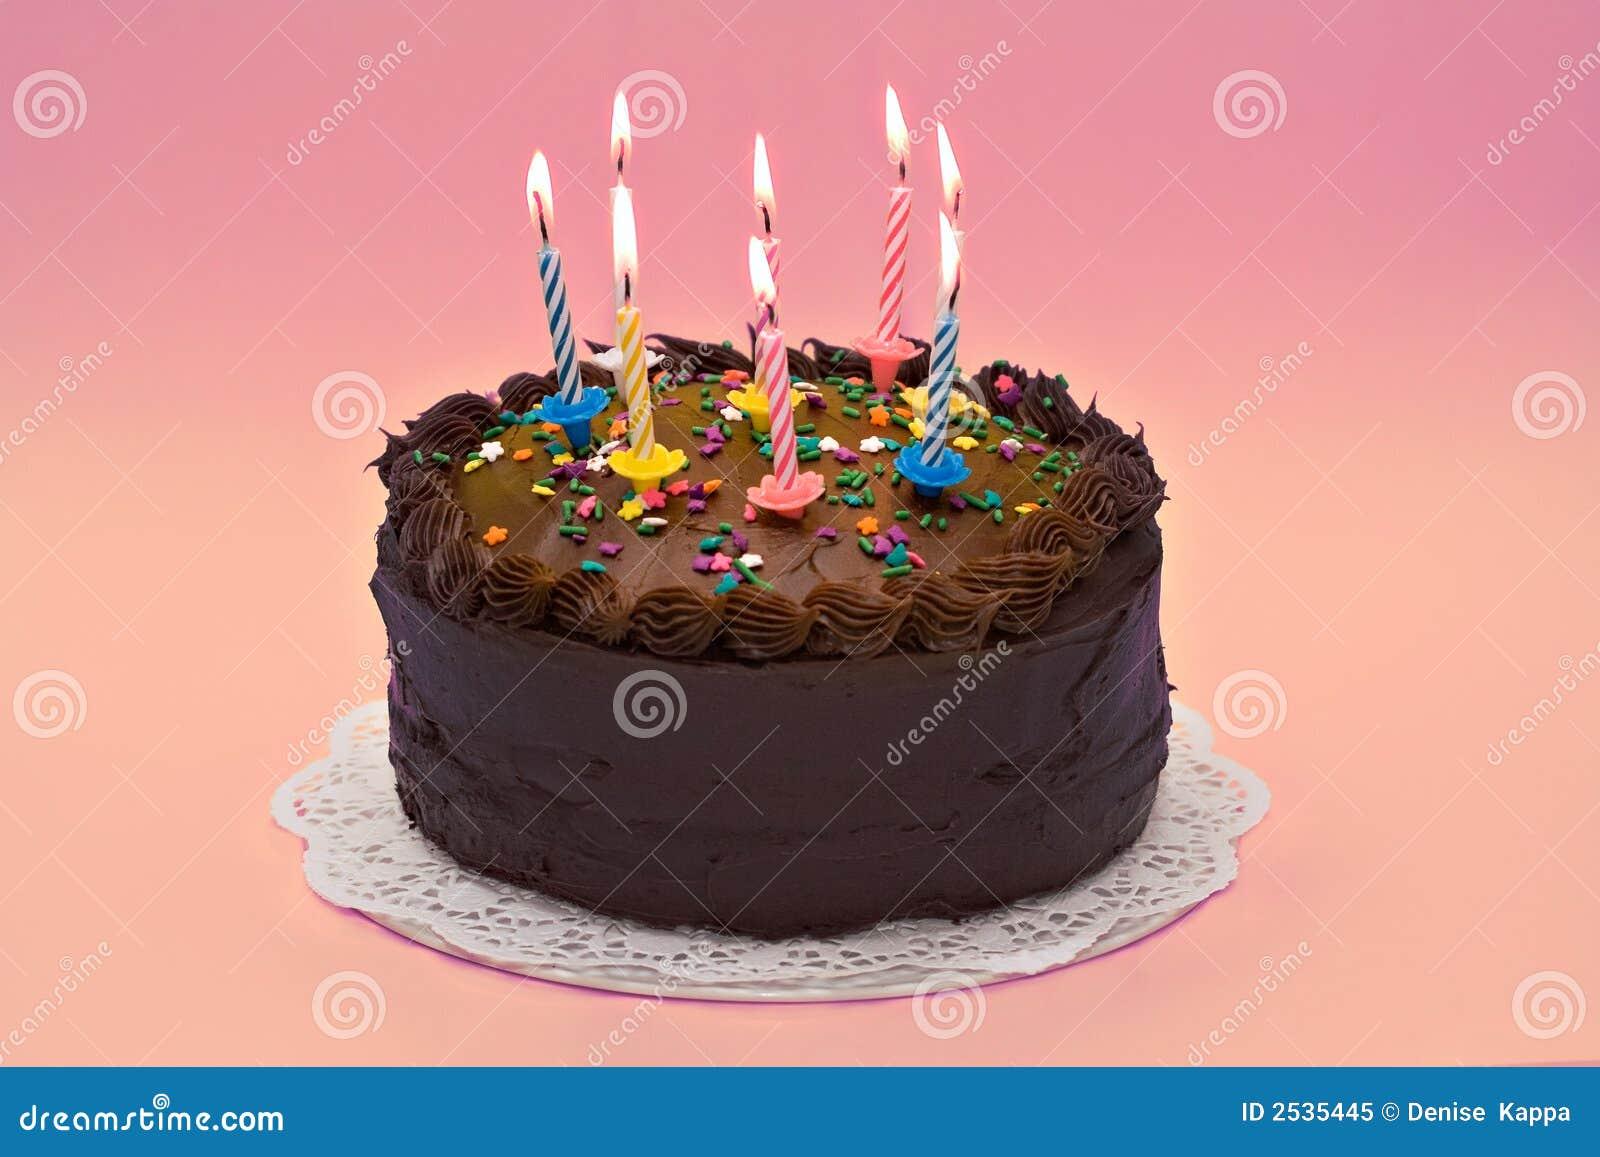 Birthday Cake Royalty Free Stock Photo Image 2535445